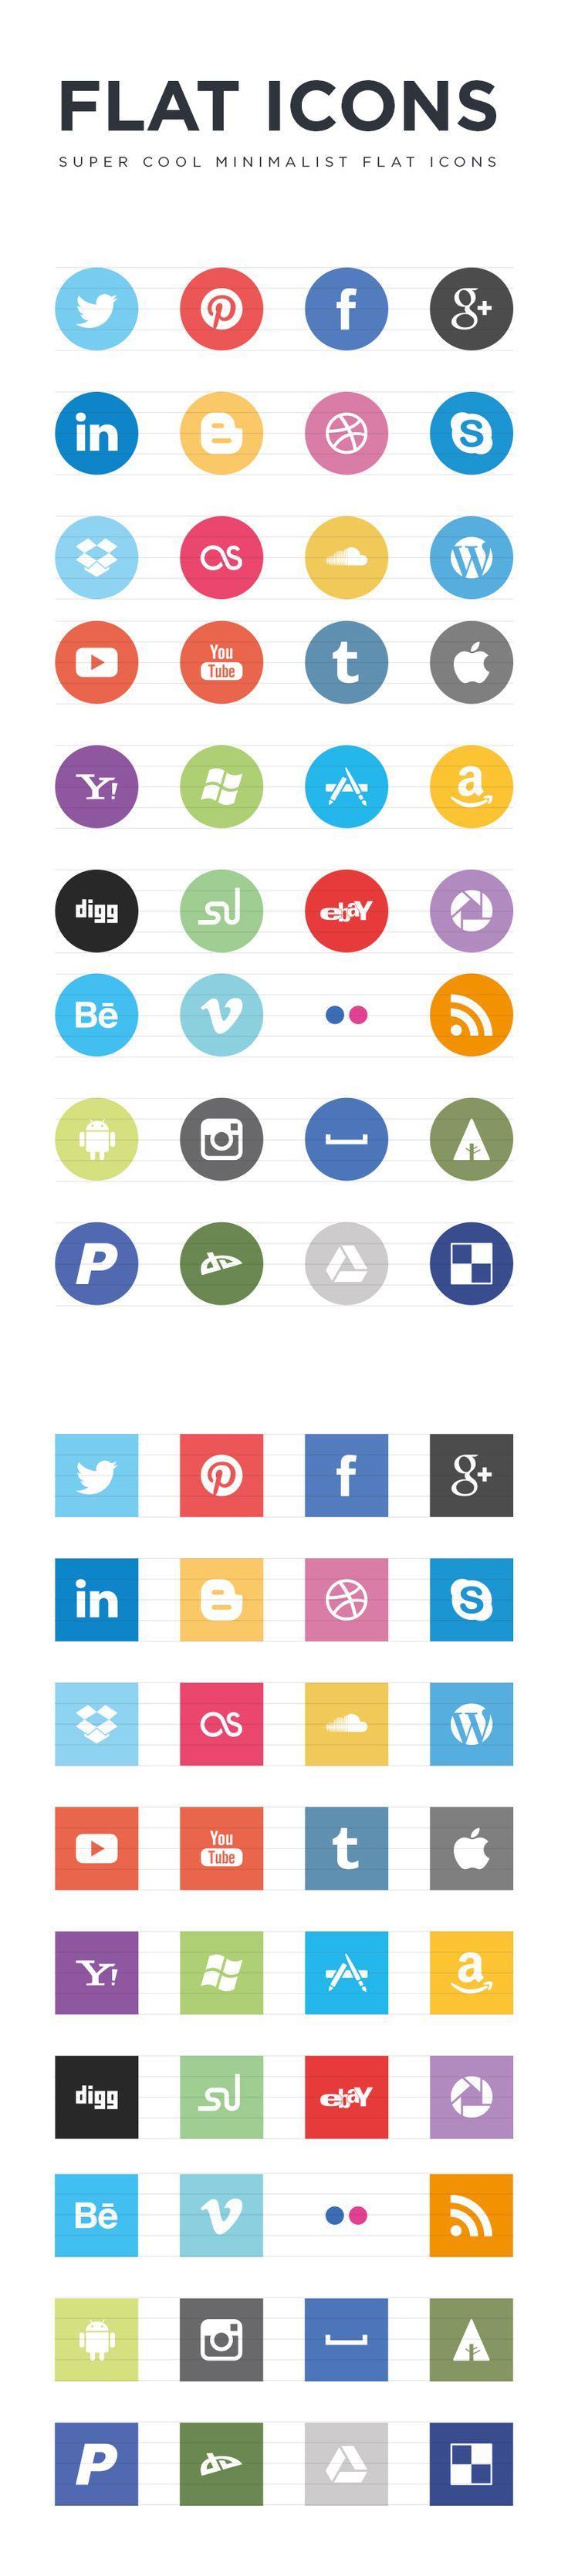 Flat Social Icons - Icons - Fribly